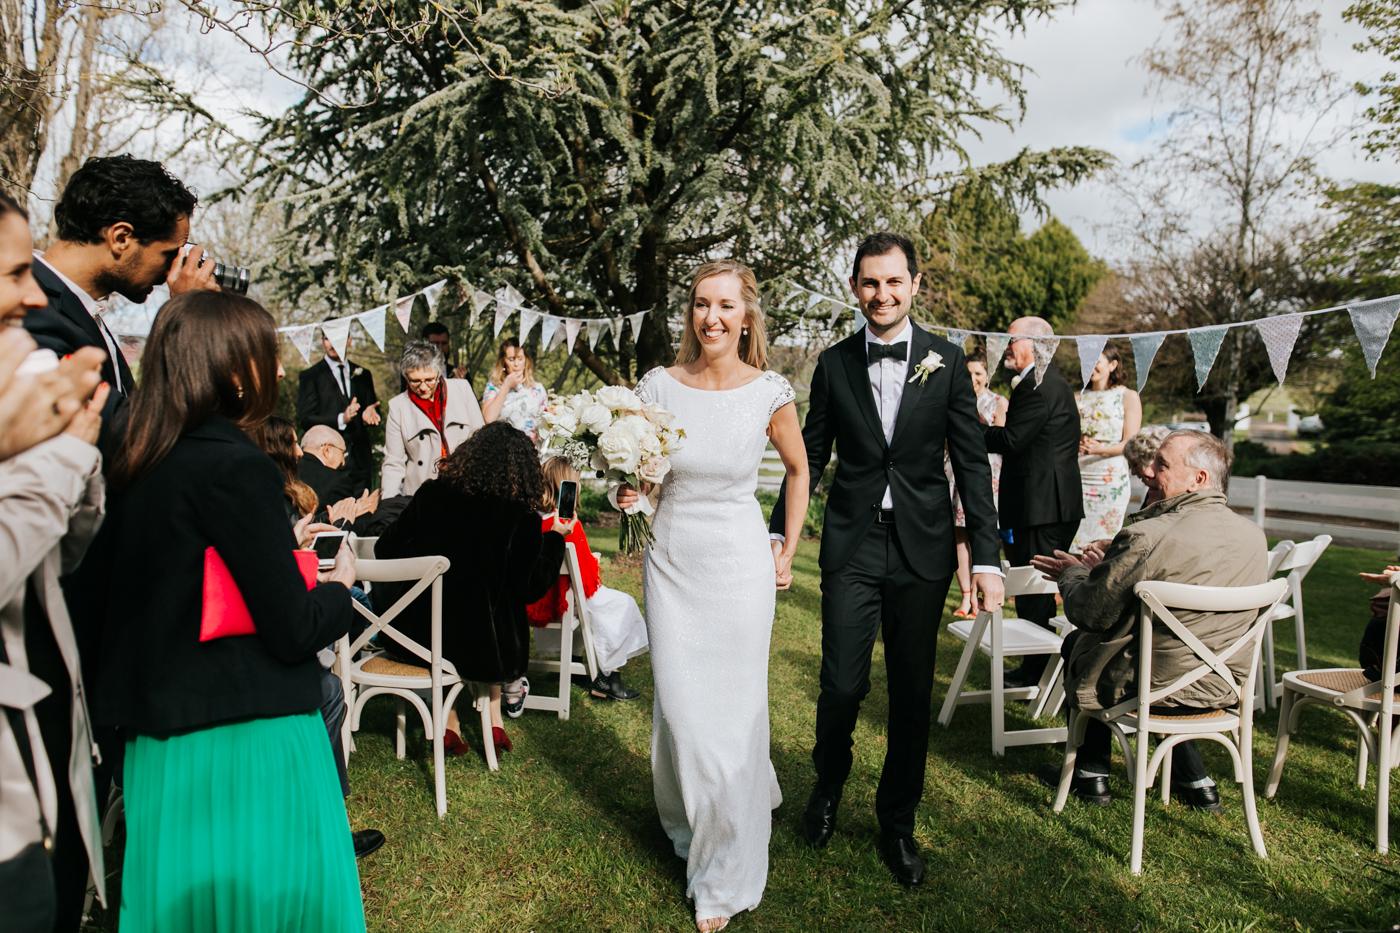 Bridget & James - Orange Country Wedding - Samantha Heather Photography-55.jpg